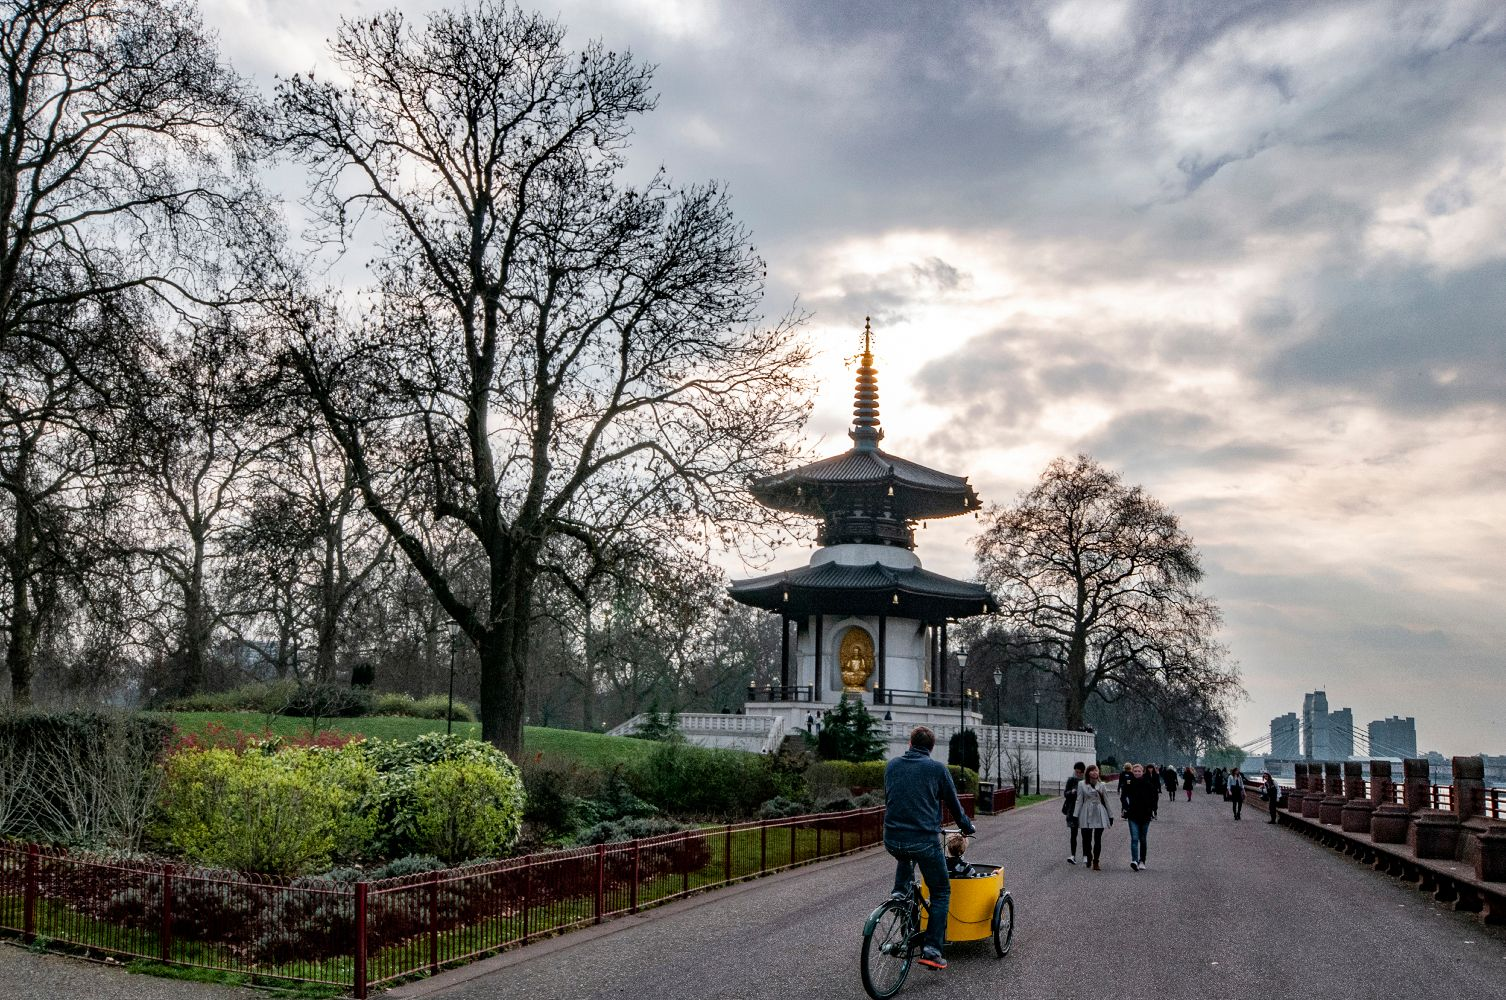 В парке БАТТЕРСИ (2) Лондон парк Баттерси Пагода_Мира